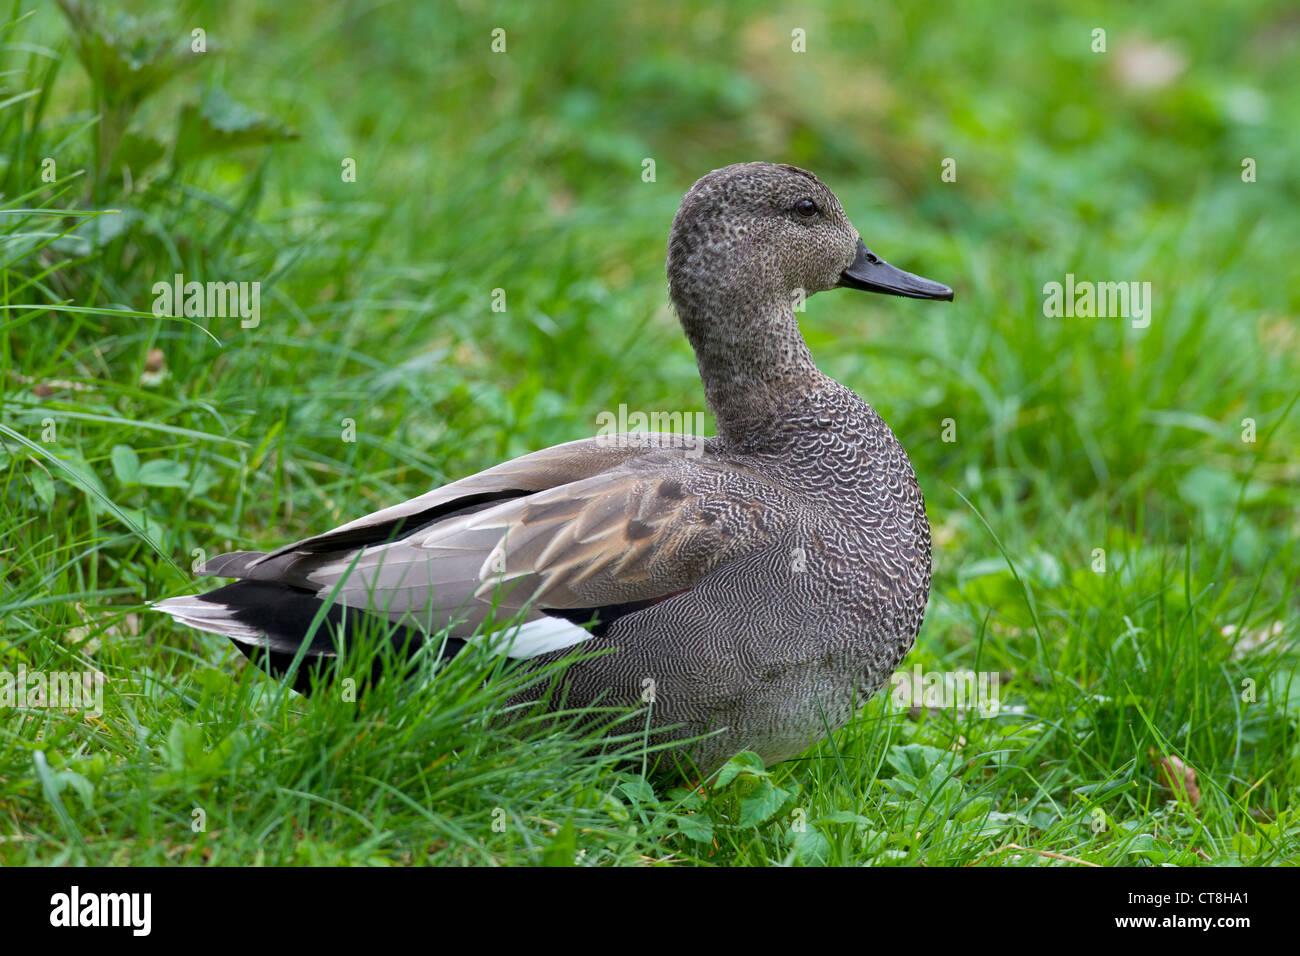 Gadwall (Anas strepera / Mareca strepera) male resting on land, Germany - Stock Image